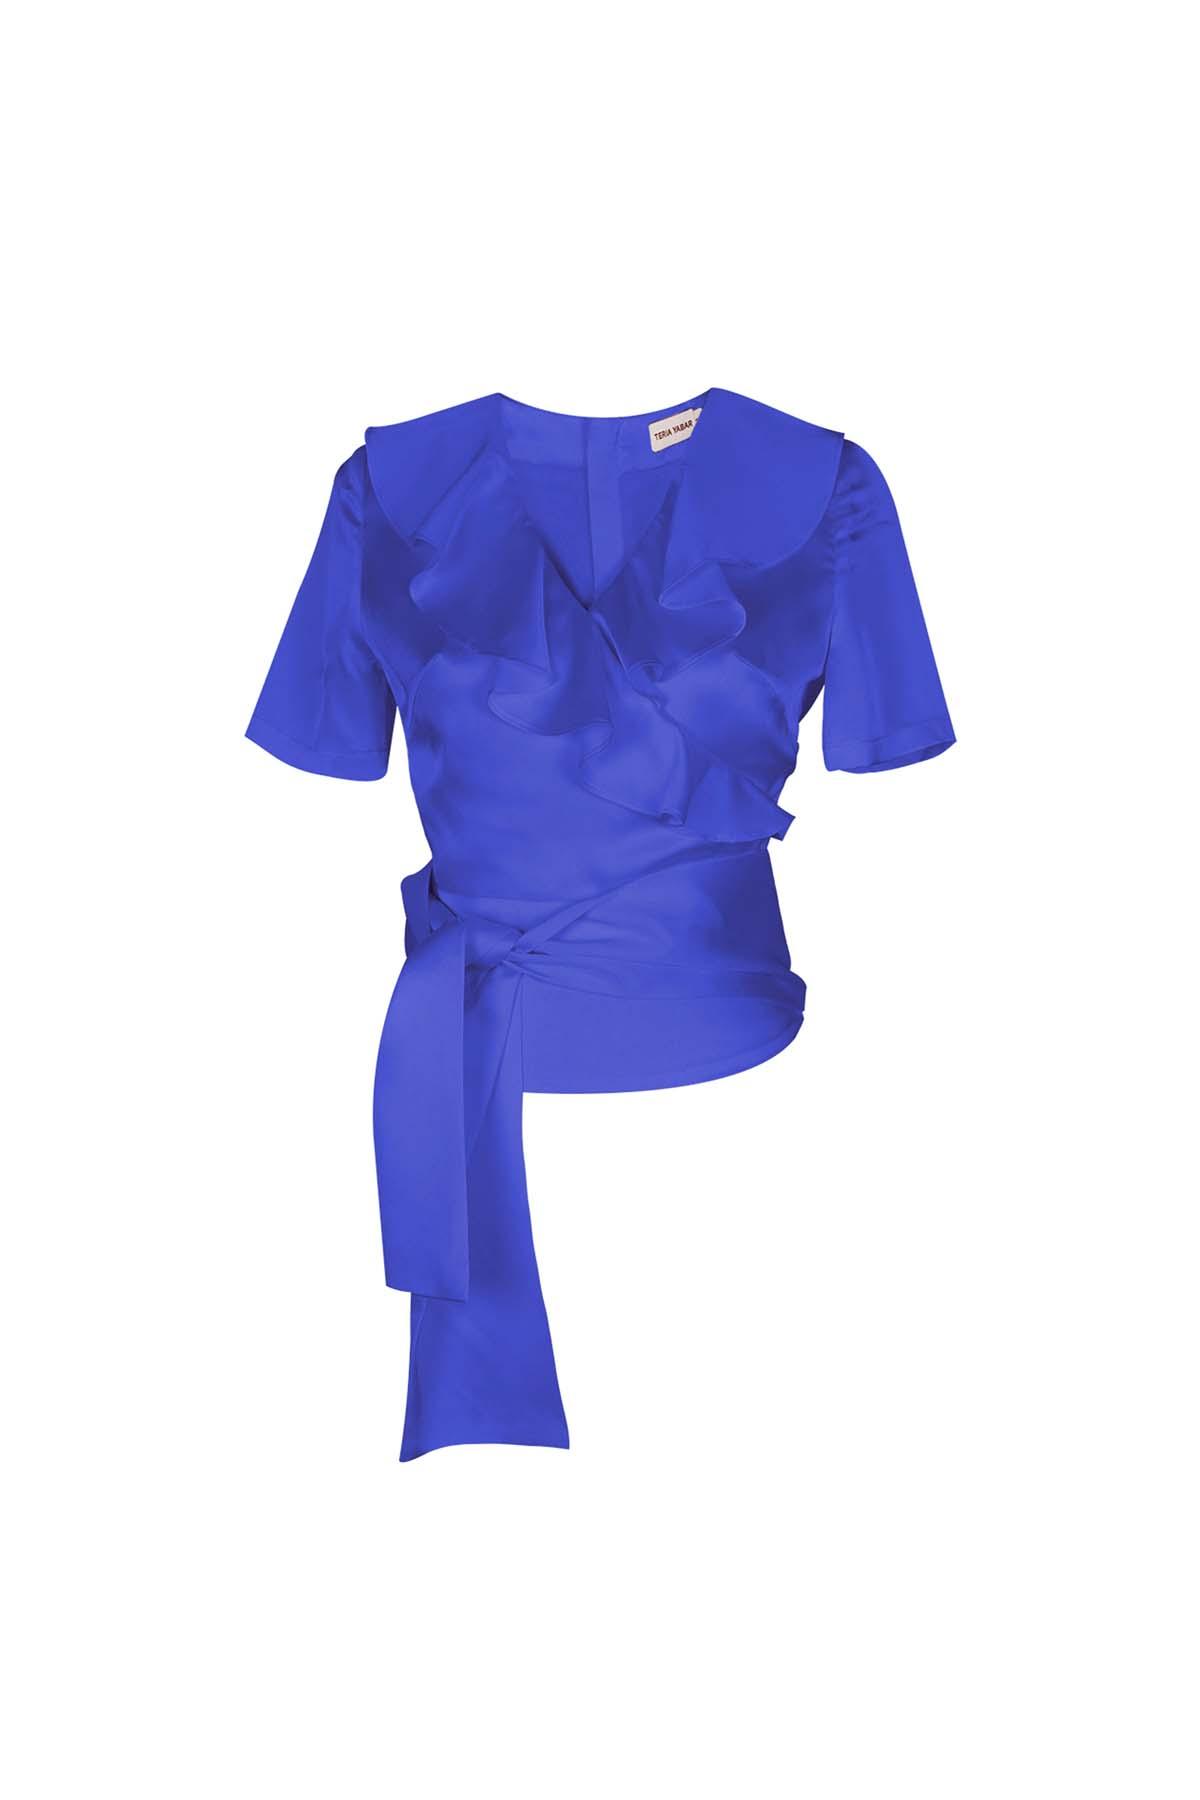 Teria Yabar - Top azul de escote cruzado